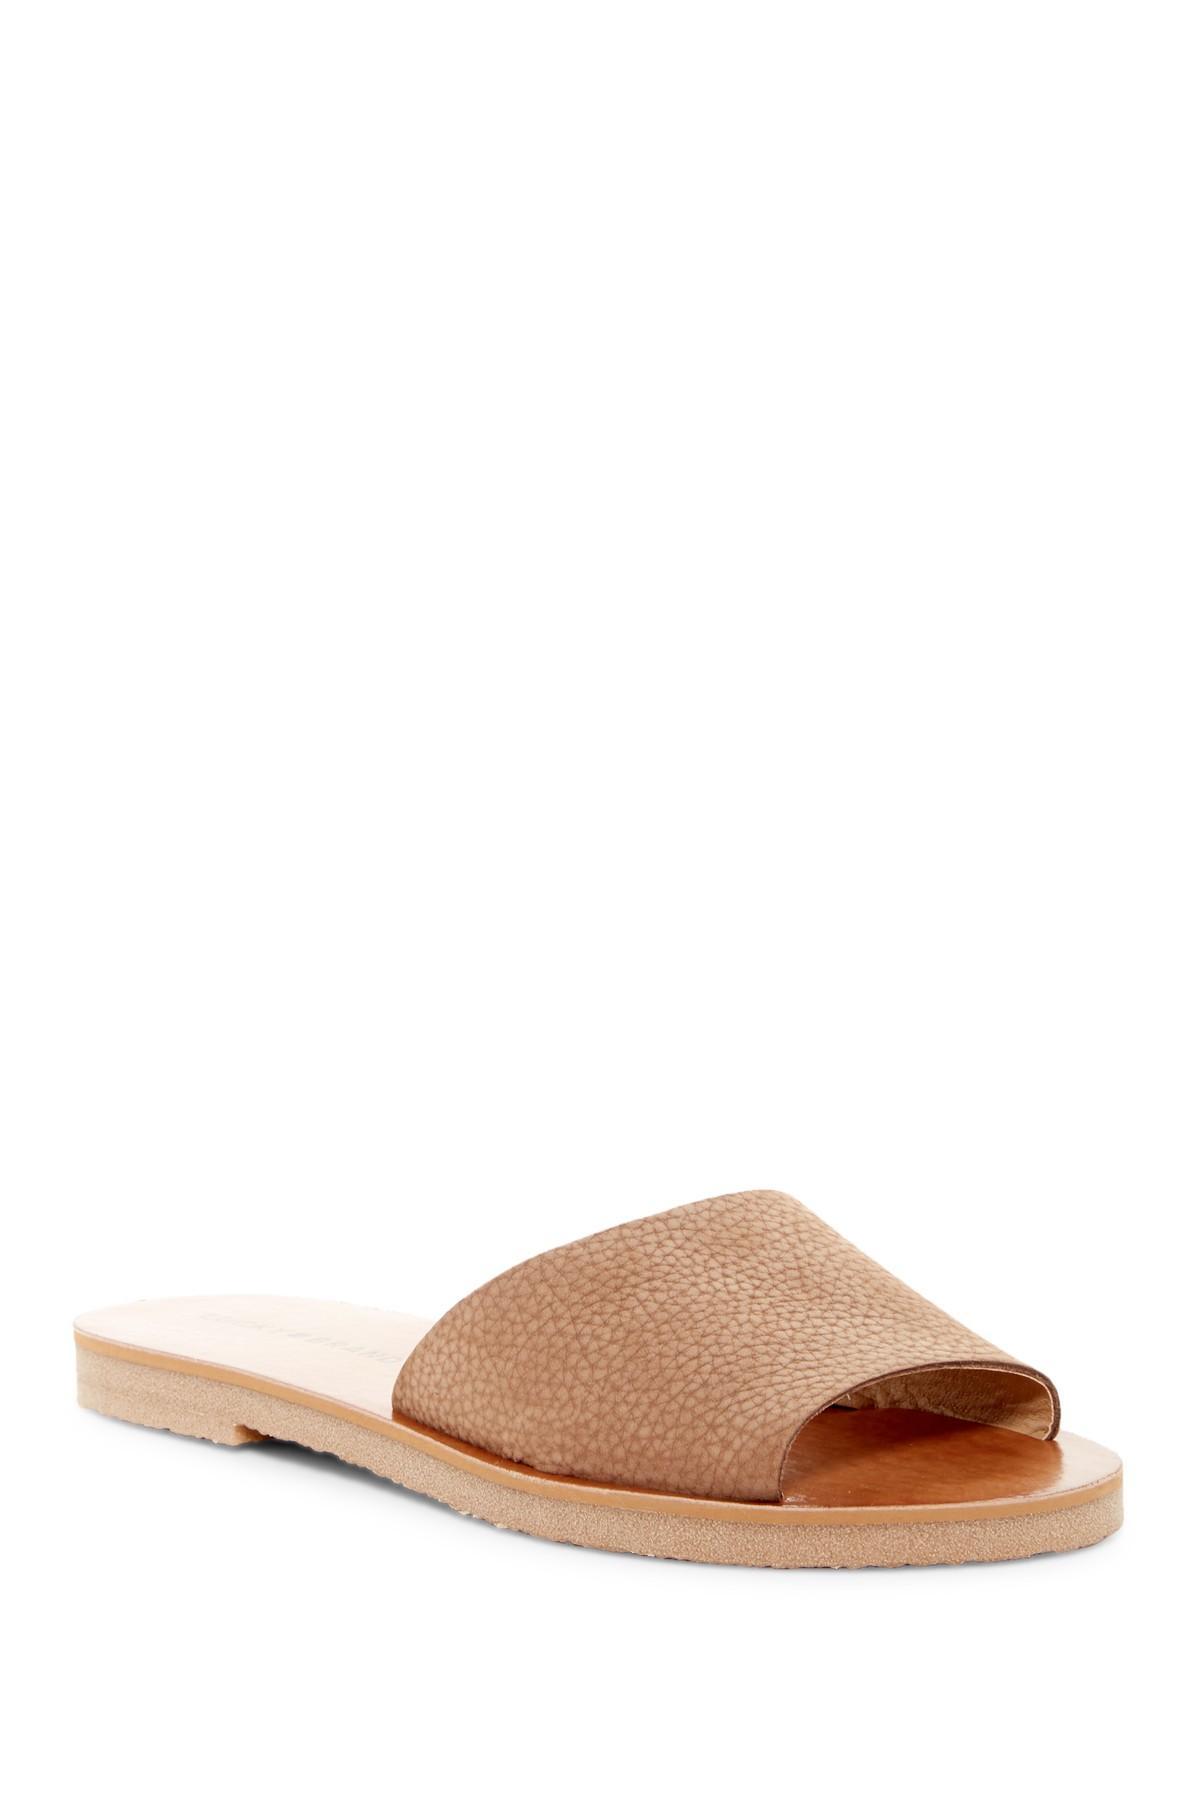 Lucky Brand Flat Sandals 28 Images Lucky Brand Lucky